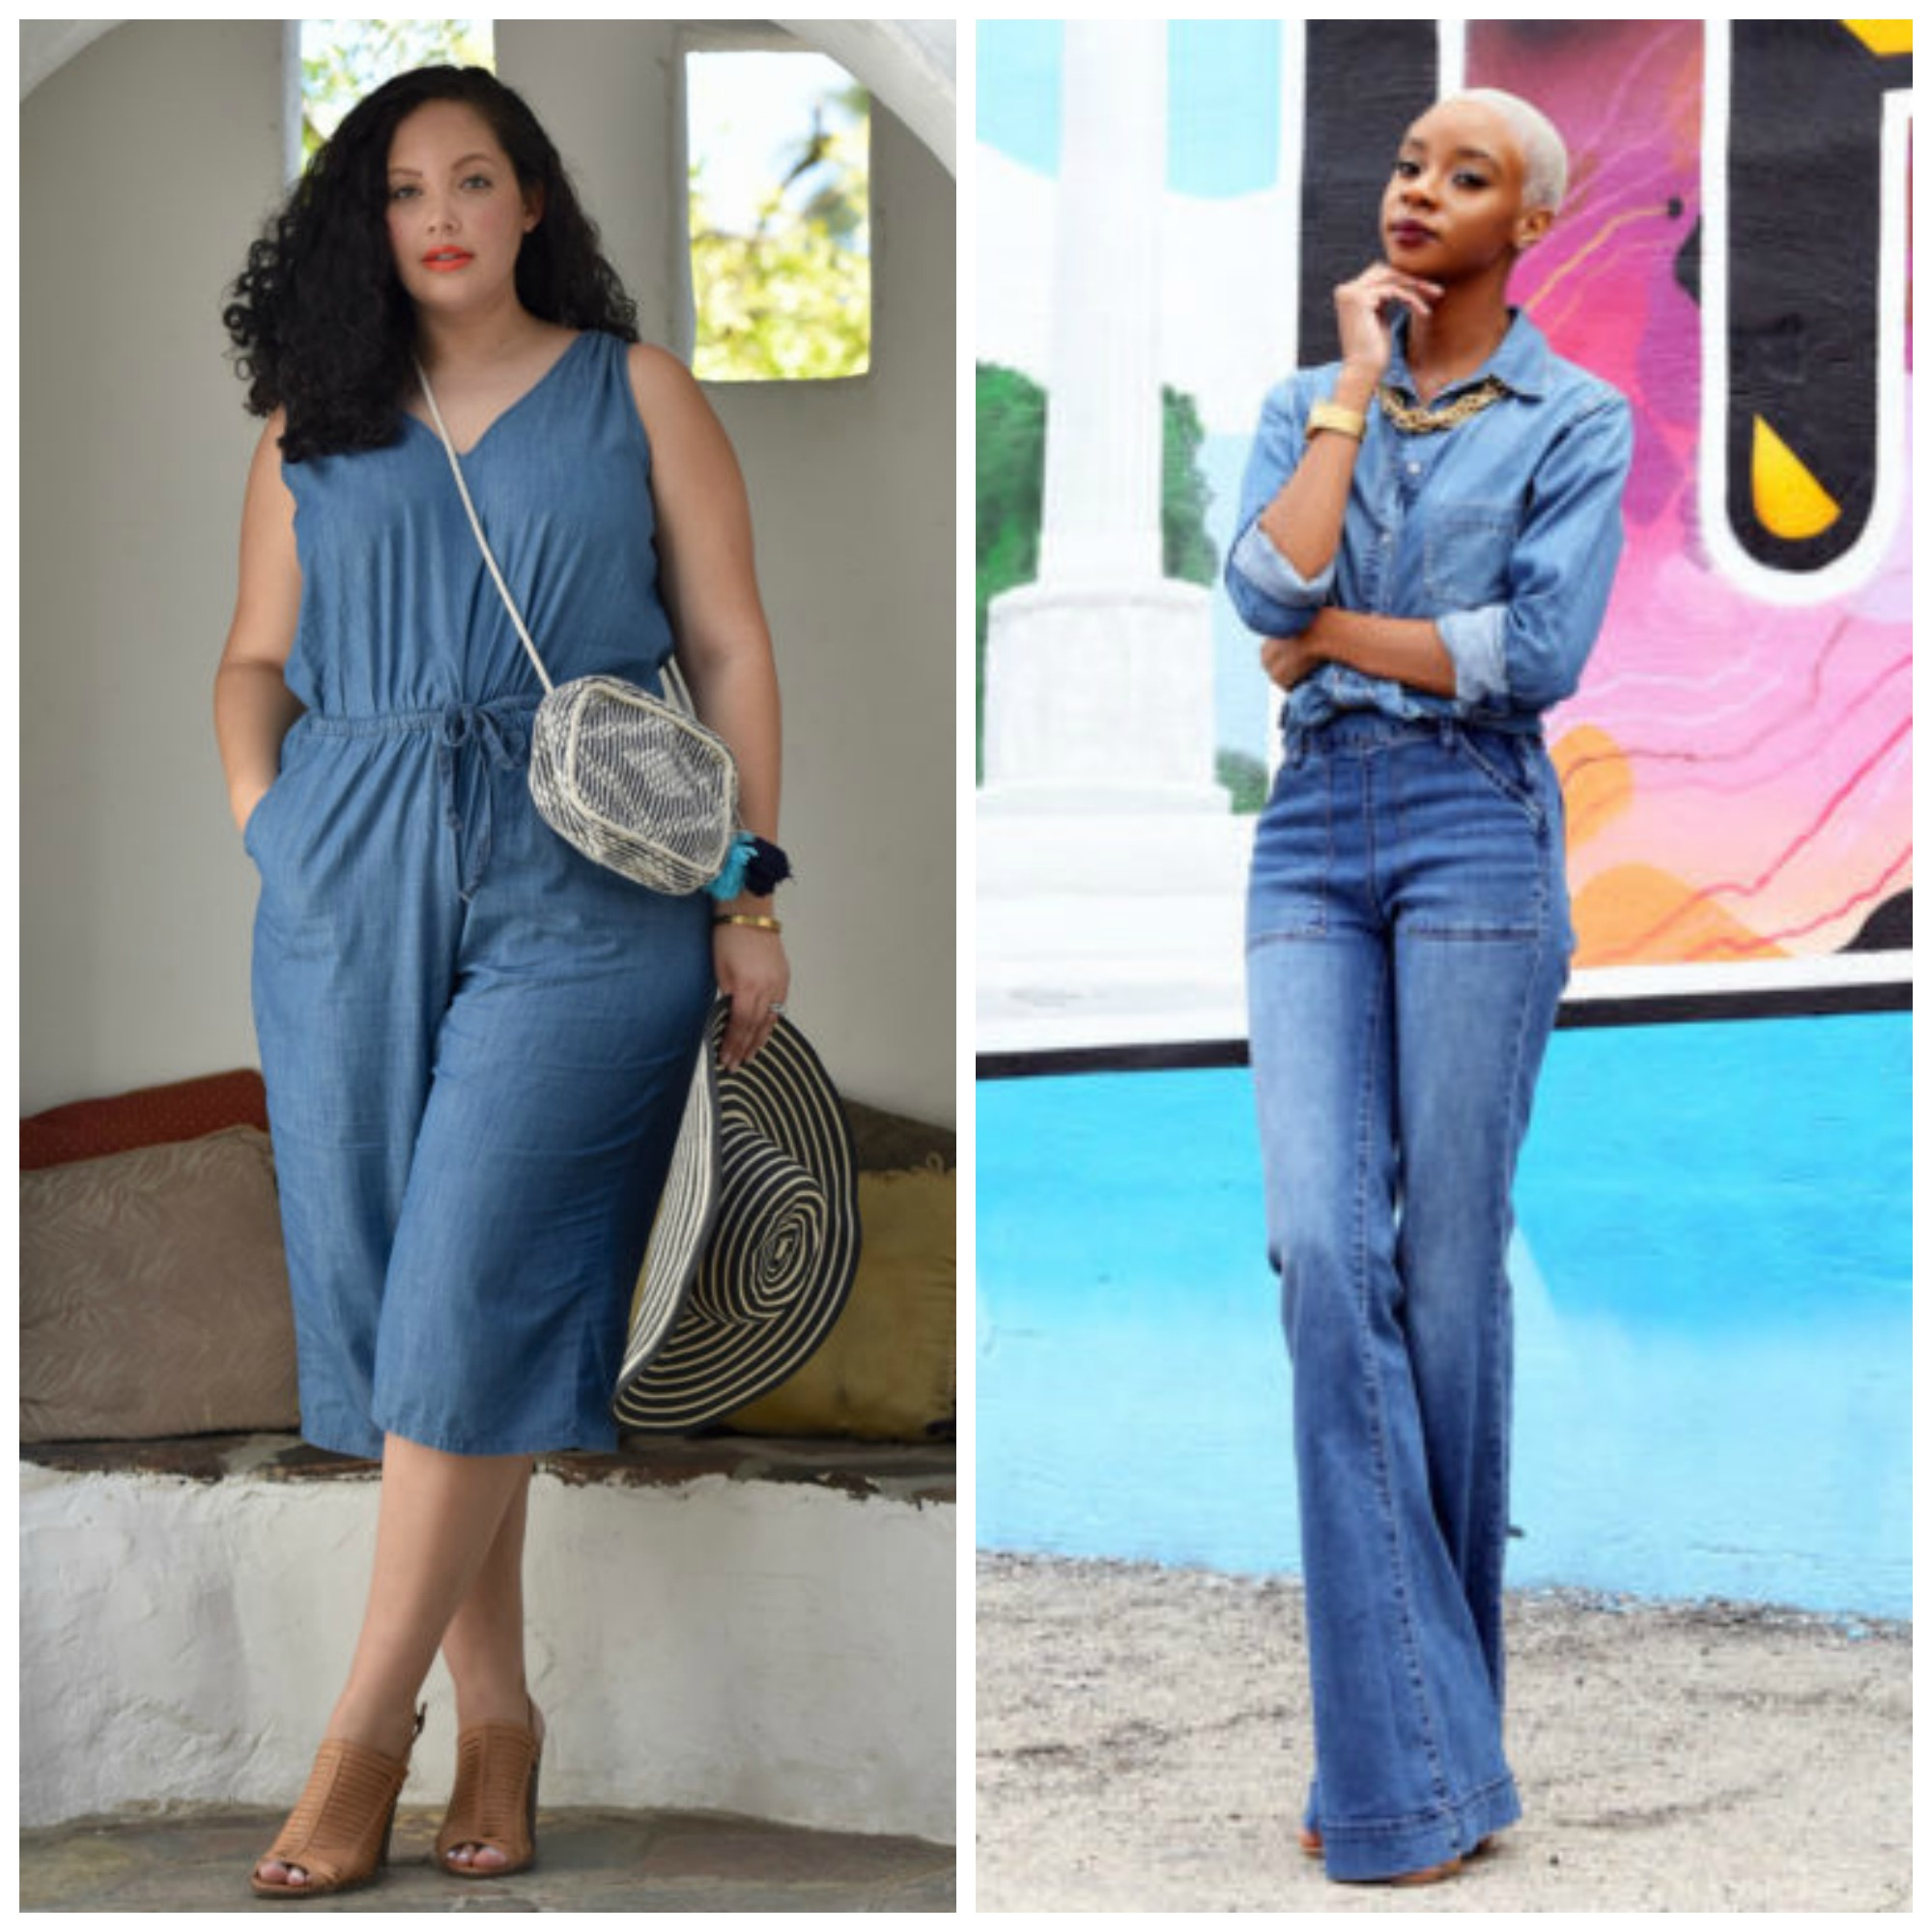 Fashion Trend: Denim On Denim